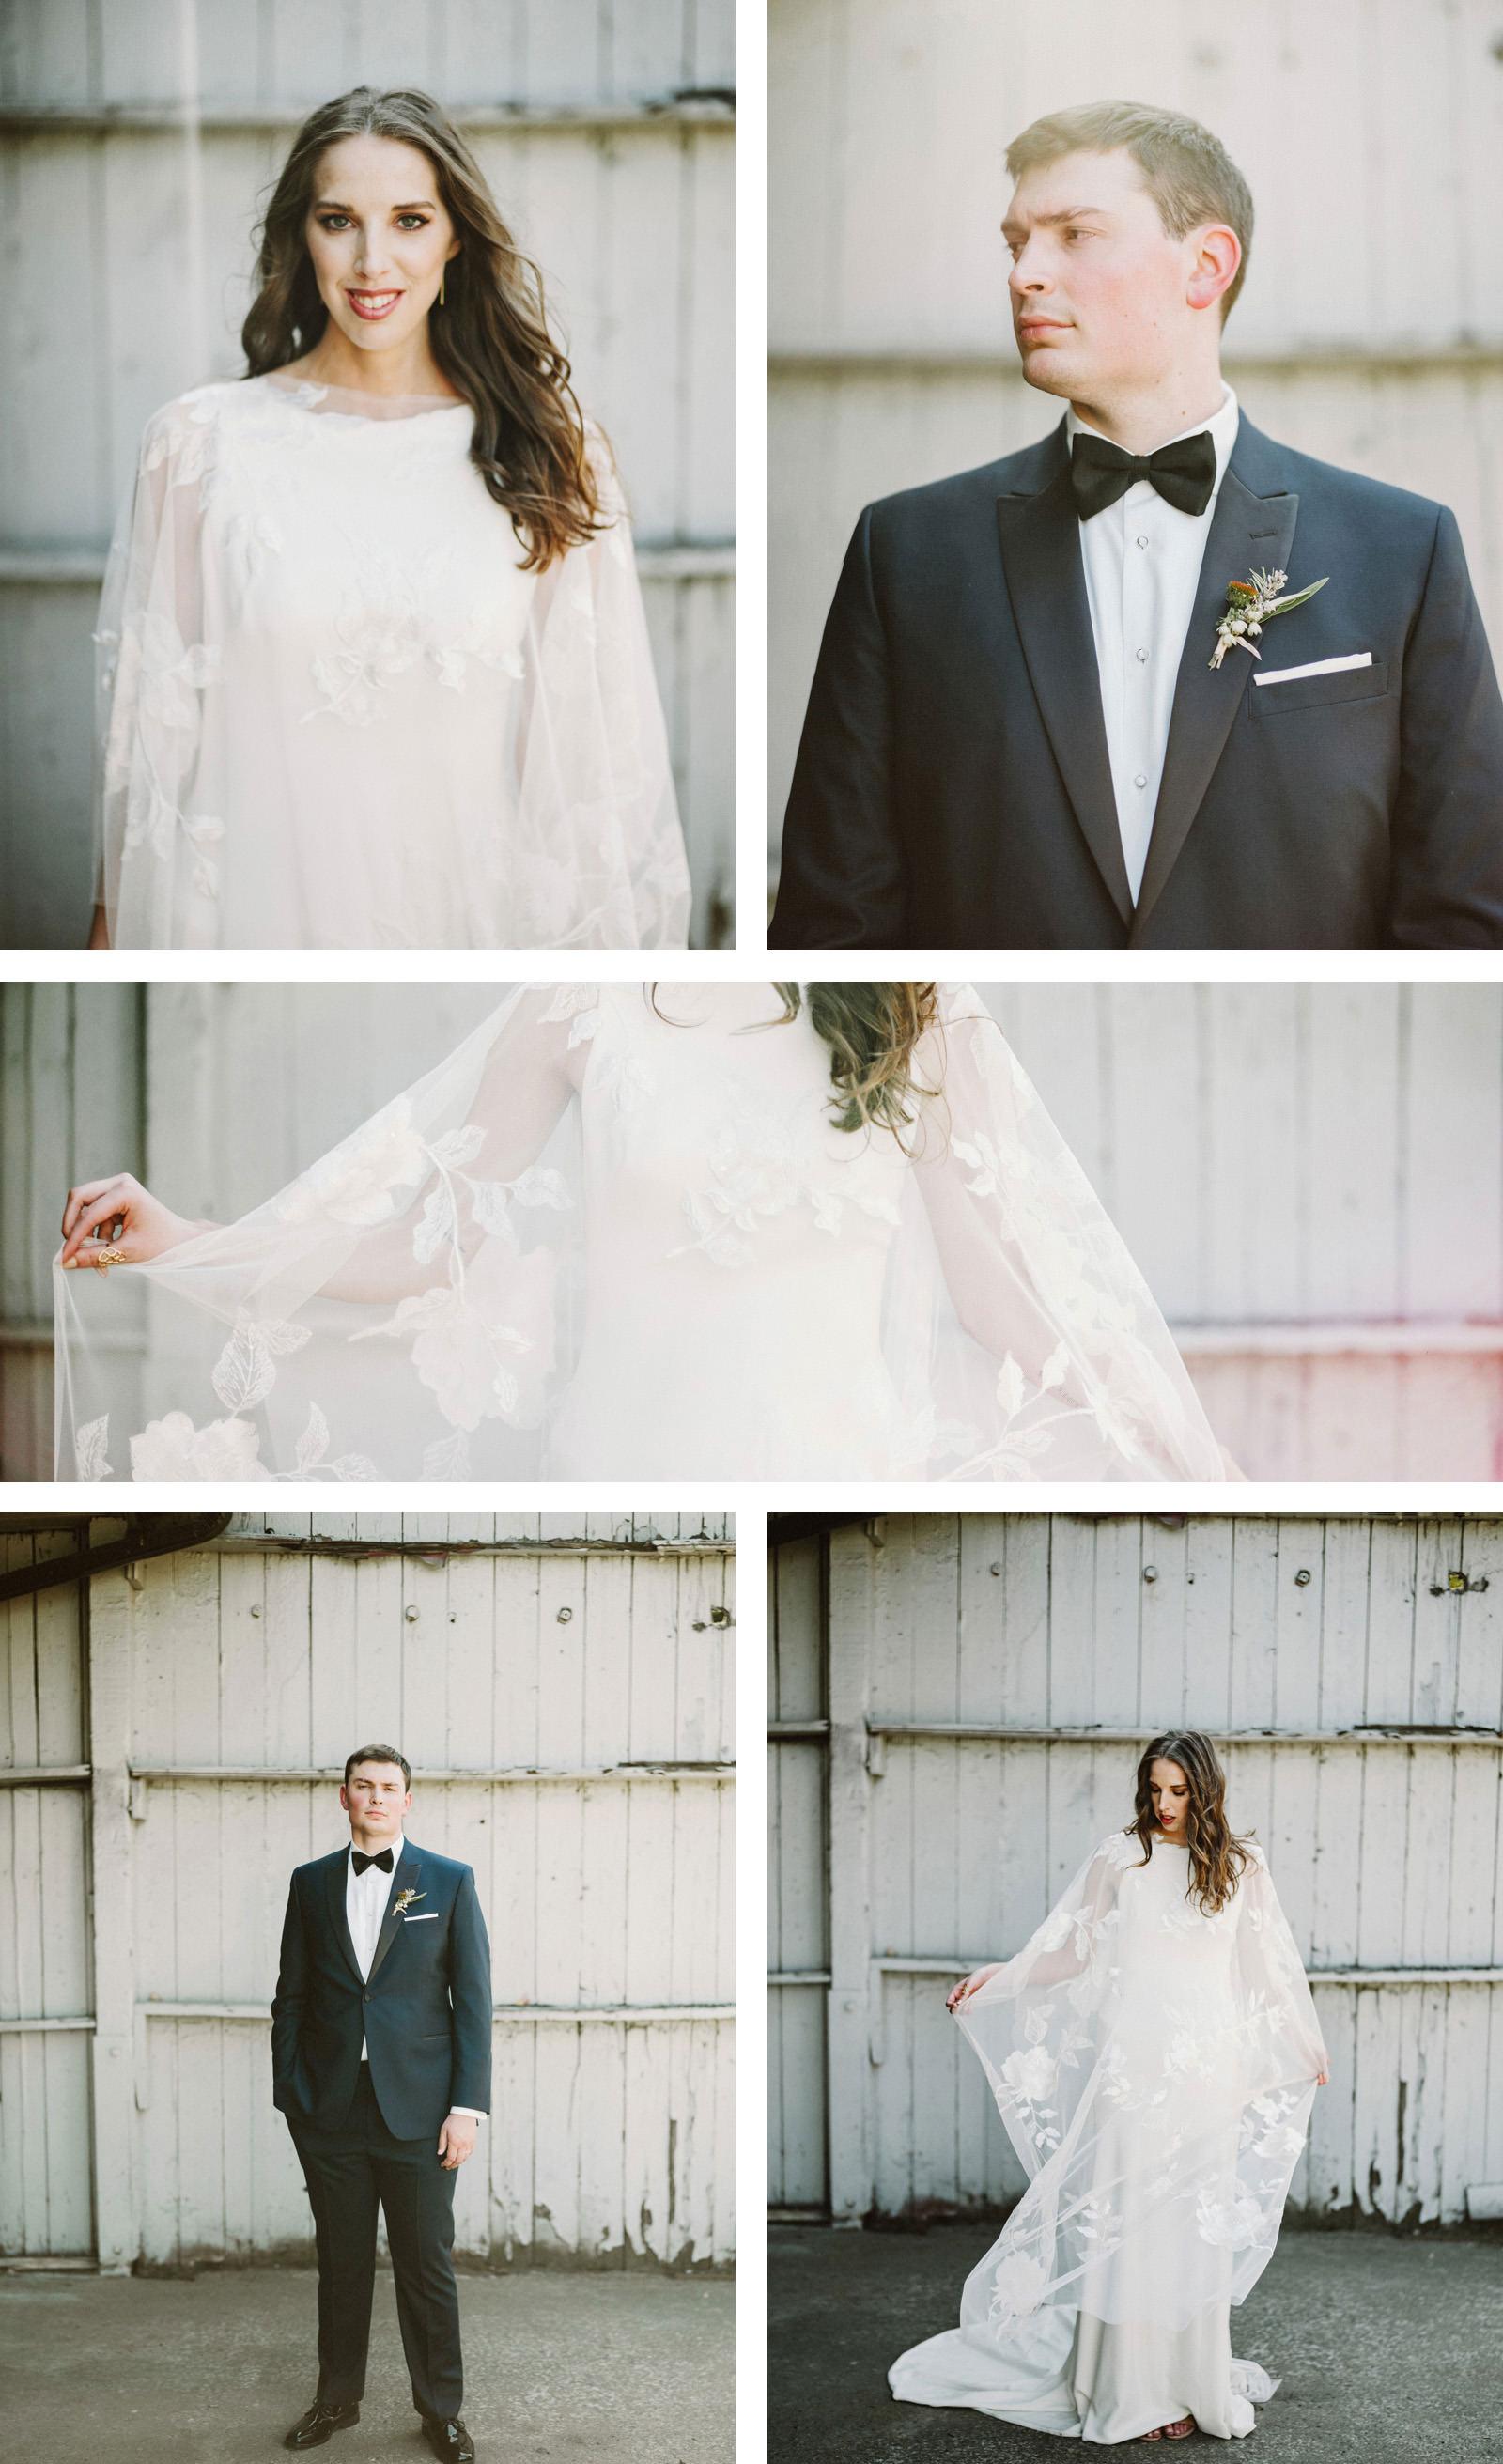 sodo-park-wedding-054 SODO PARK WEDDING